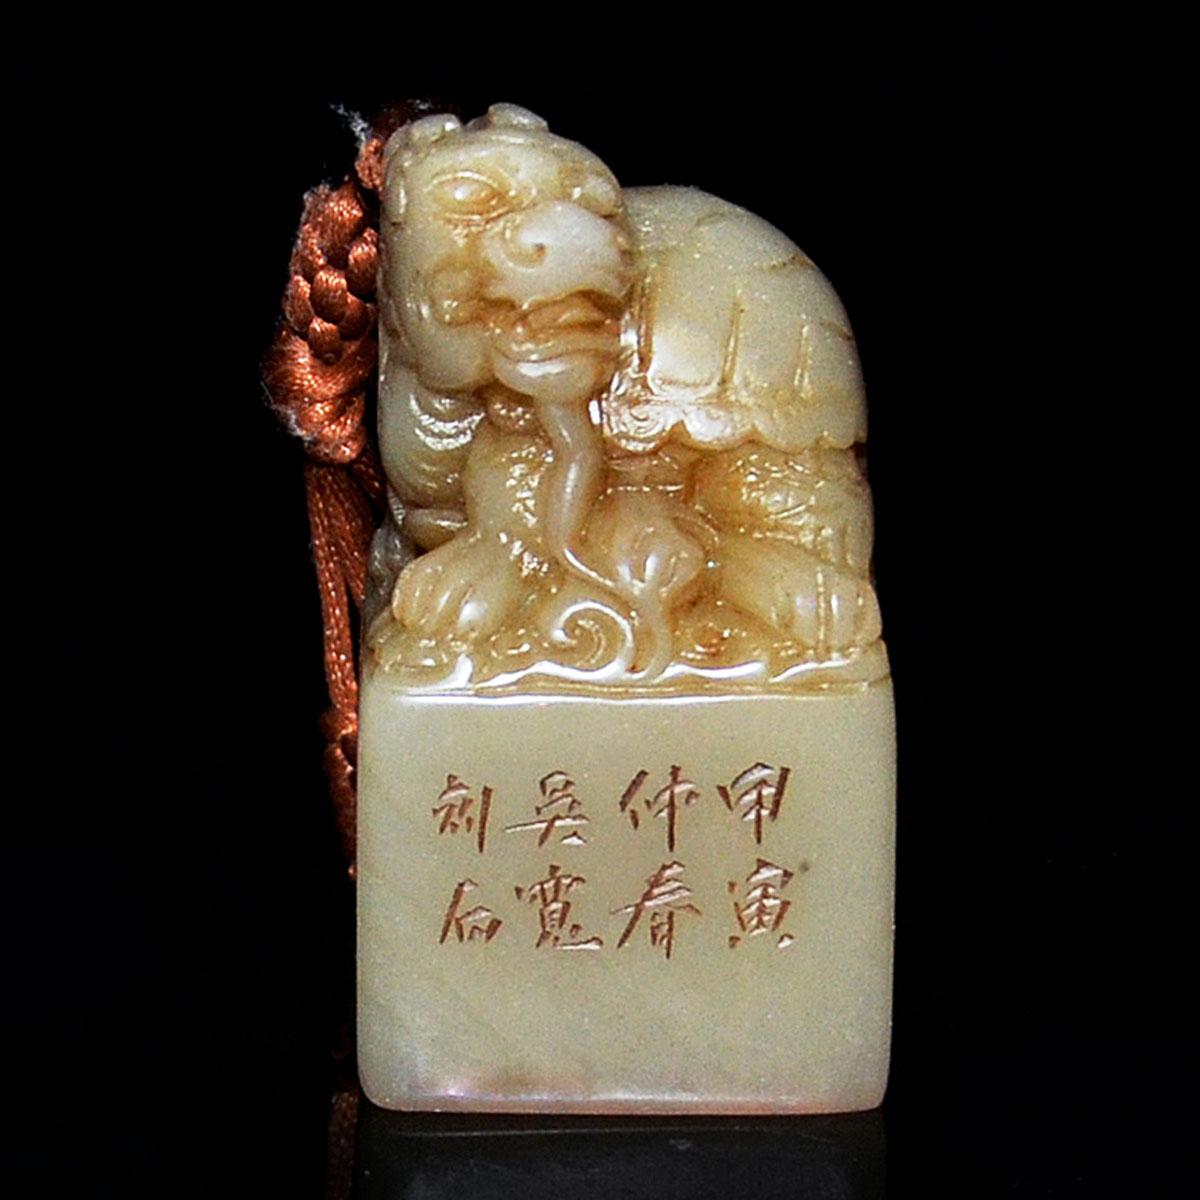 Lot 29 - 明-吳寬-芙蓉石雕龍龜鈕印章 刻文(甲寅仲春吳寬刻石) 印文(修竹書房) Ming, Furong Stone Seal with Carved Dragon-Tortoise Knob .